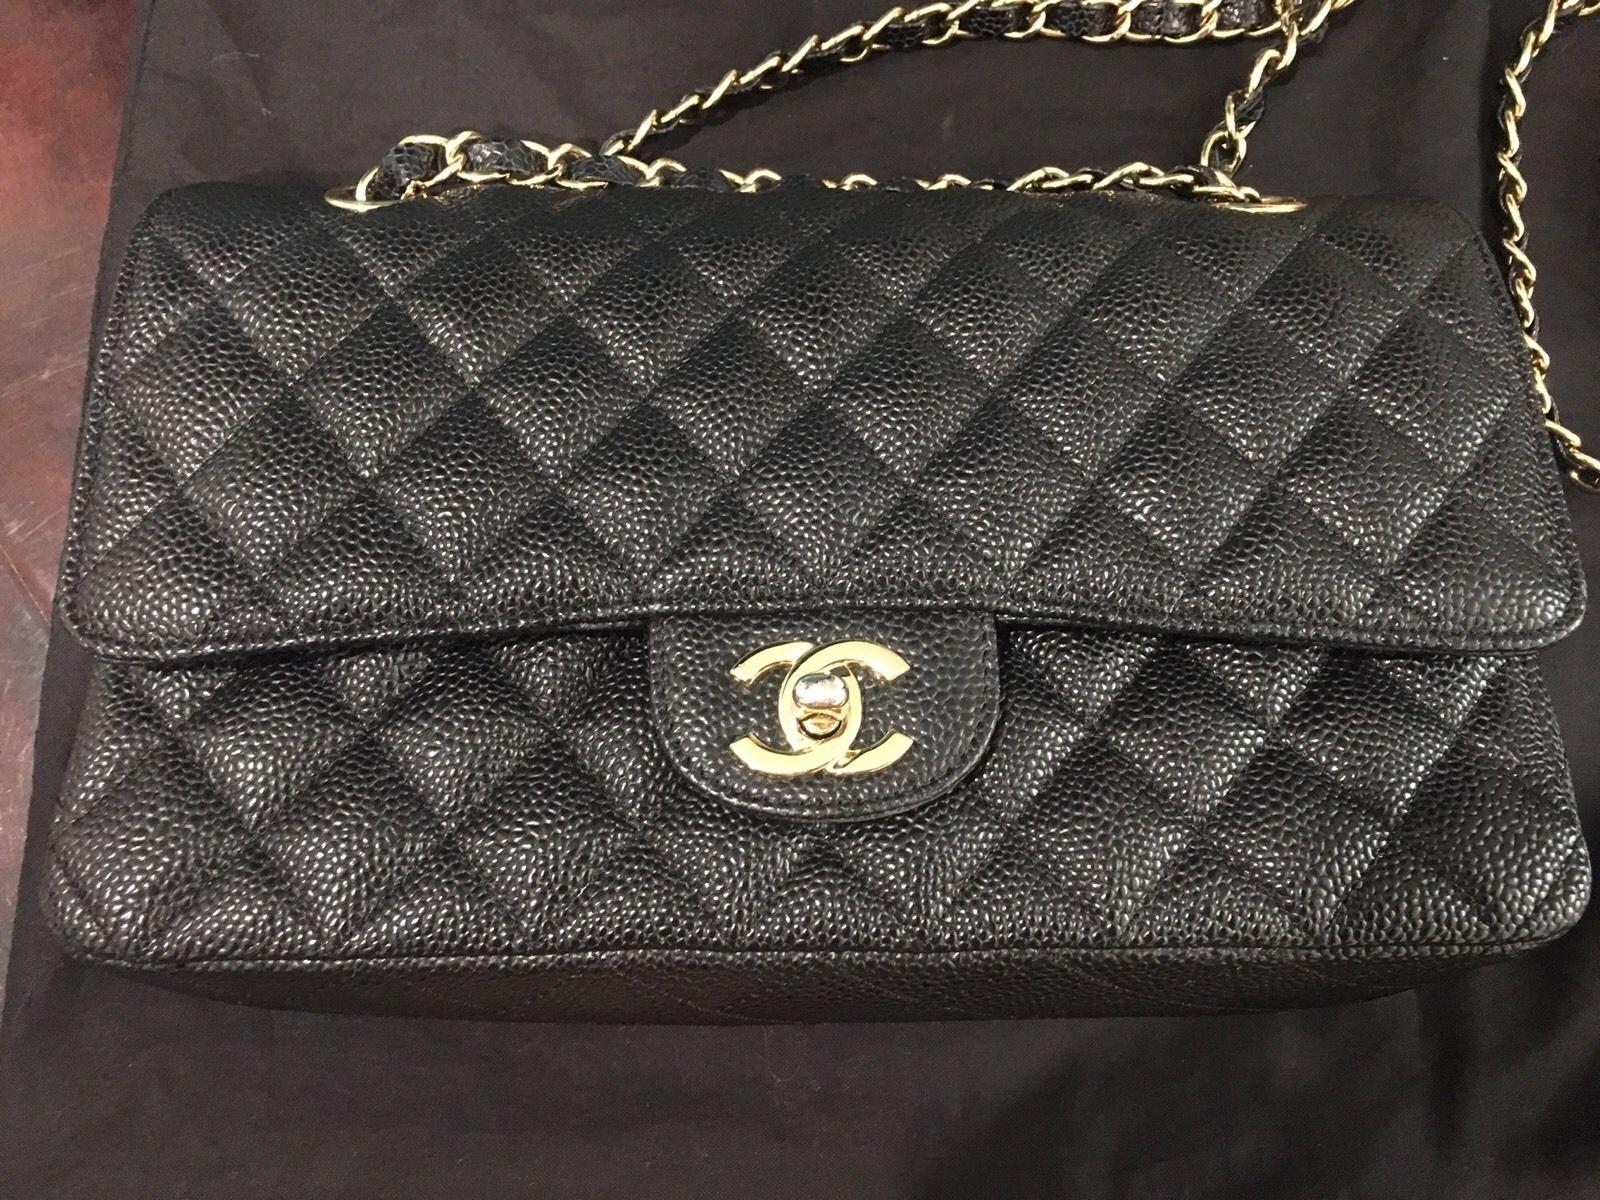 Vintage Chanel Chanel Vintage Chanel Chain Crossbody Bag